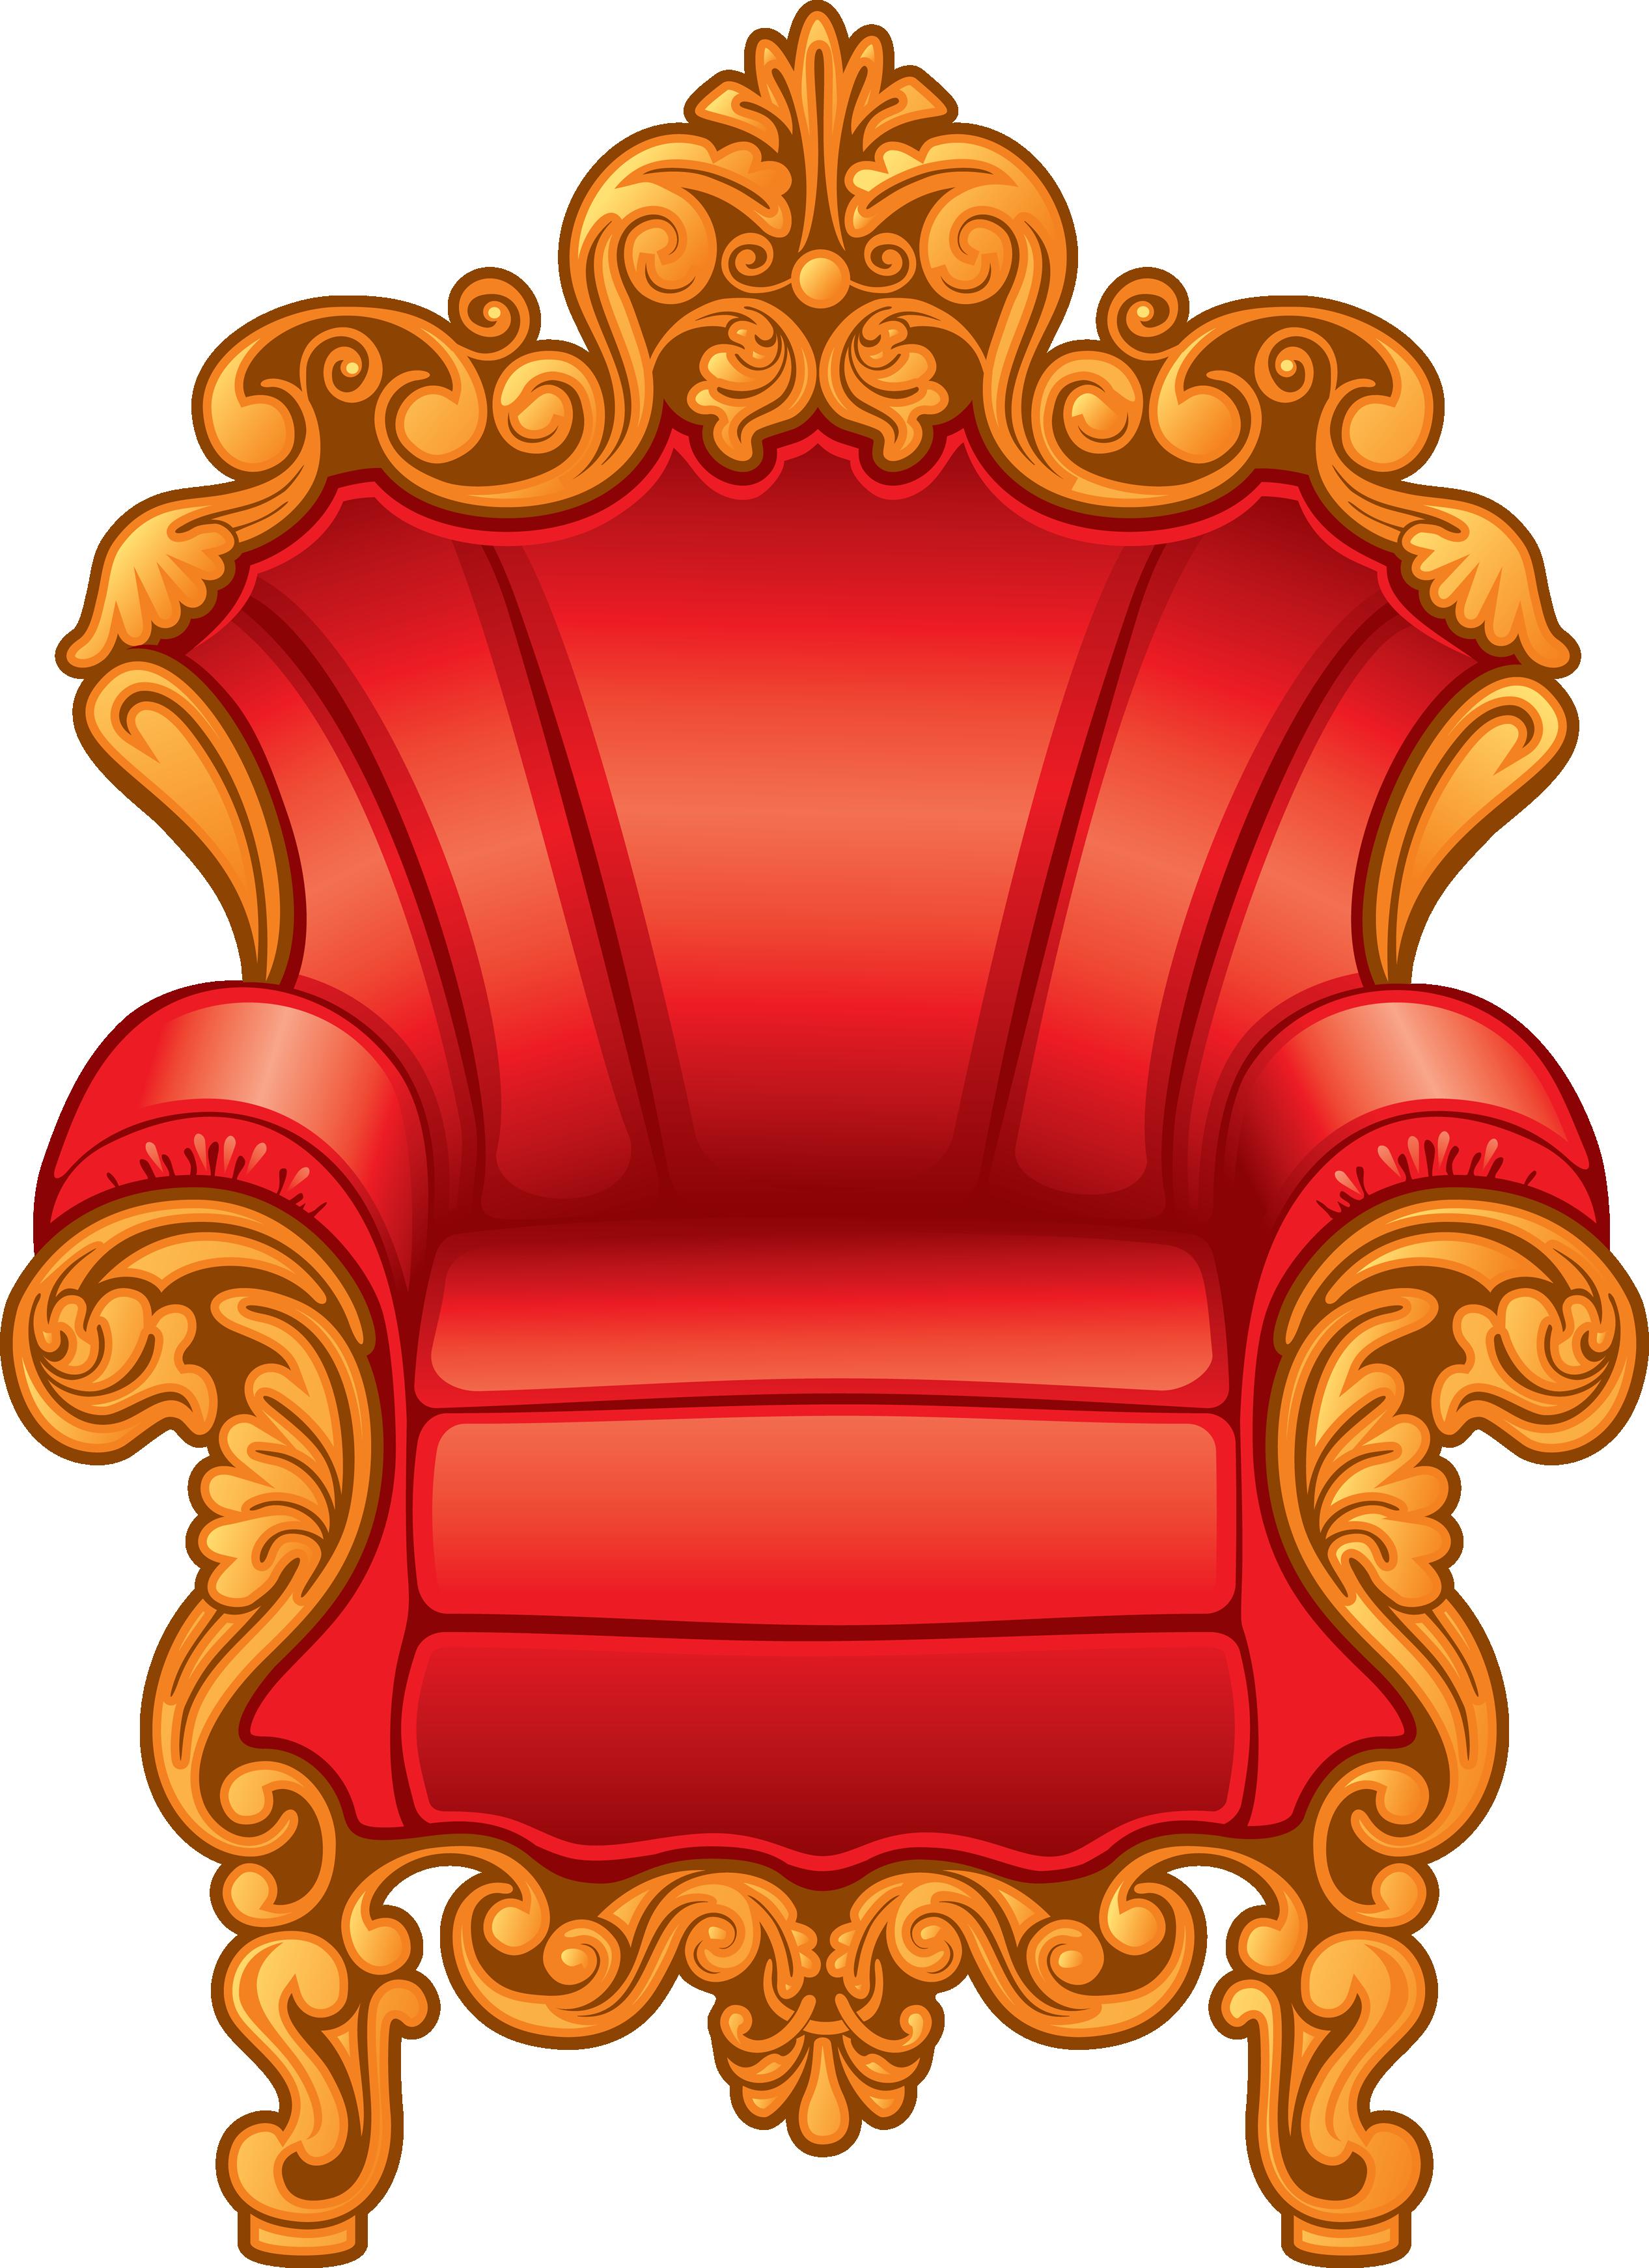 2533x3484 Throne Clipart Transparent